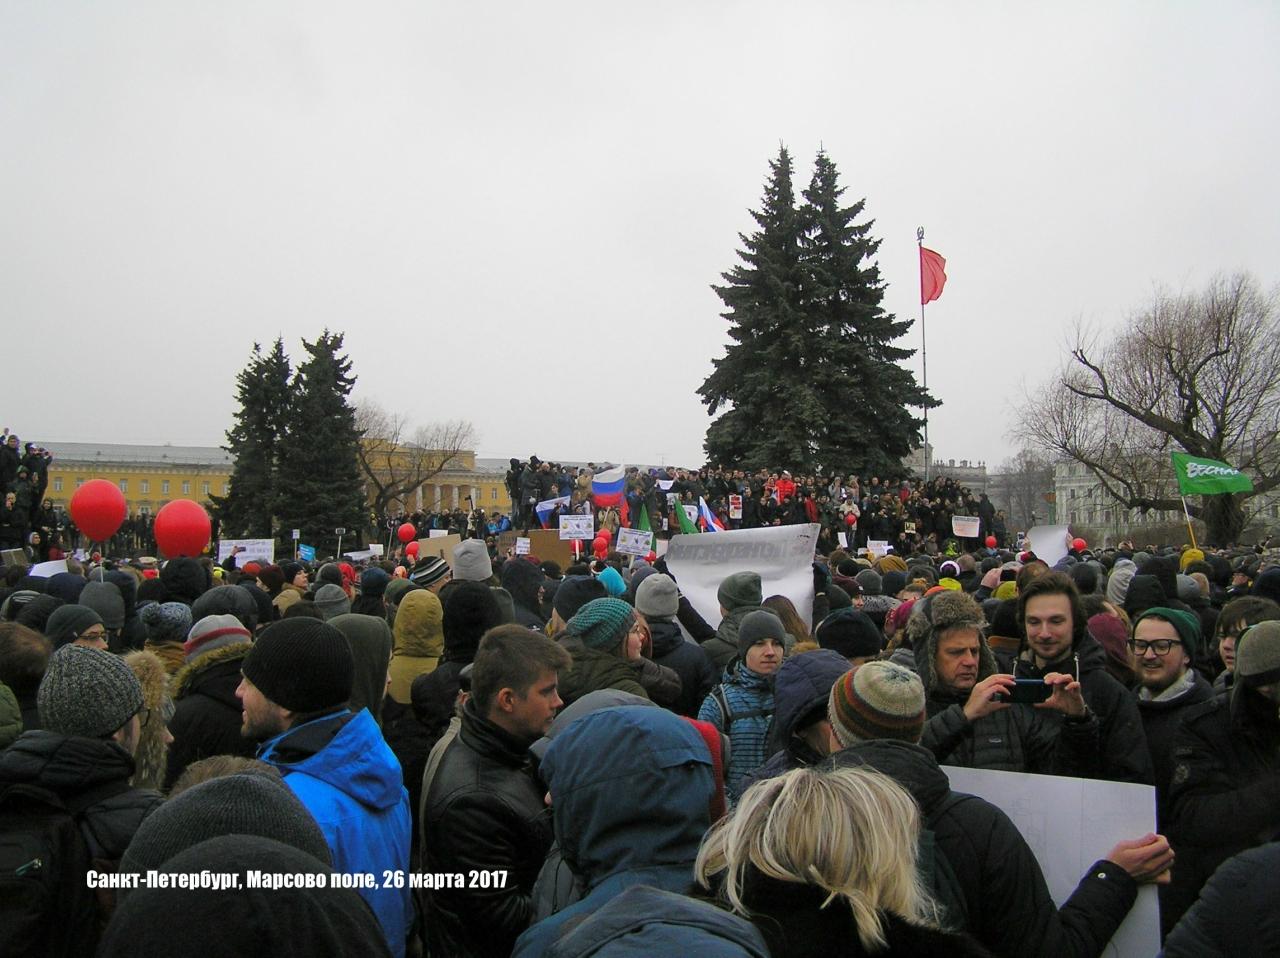 Санкт-Петербург Марсово поле 28.JPG